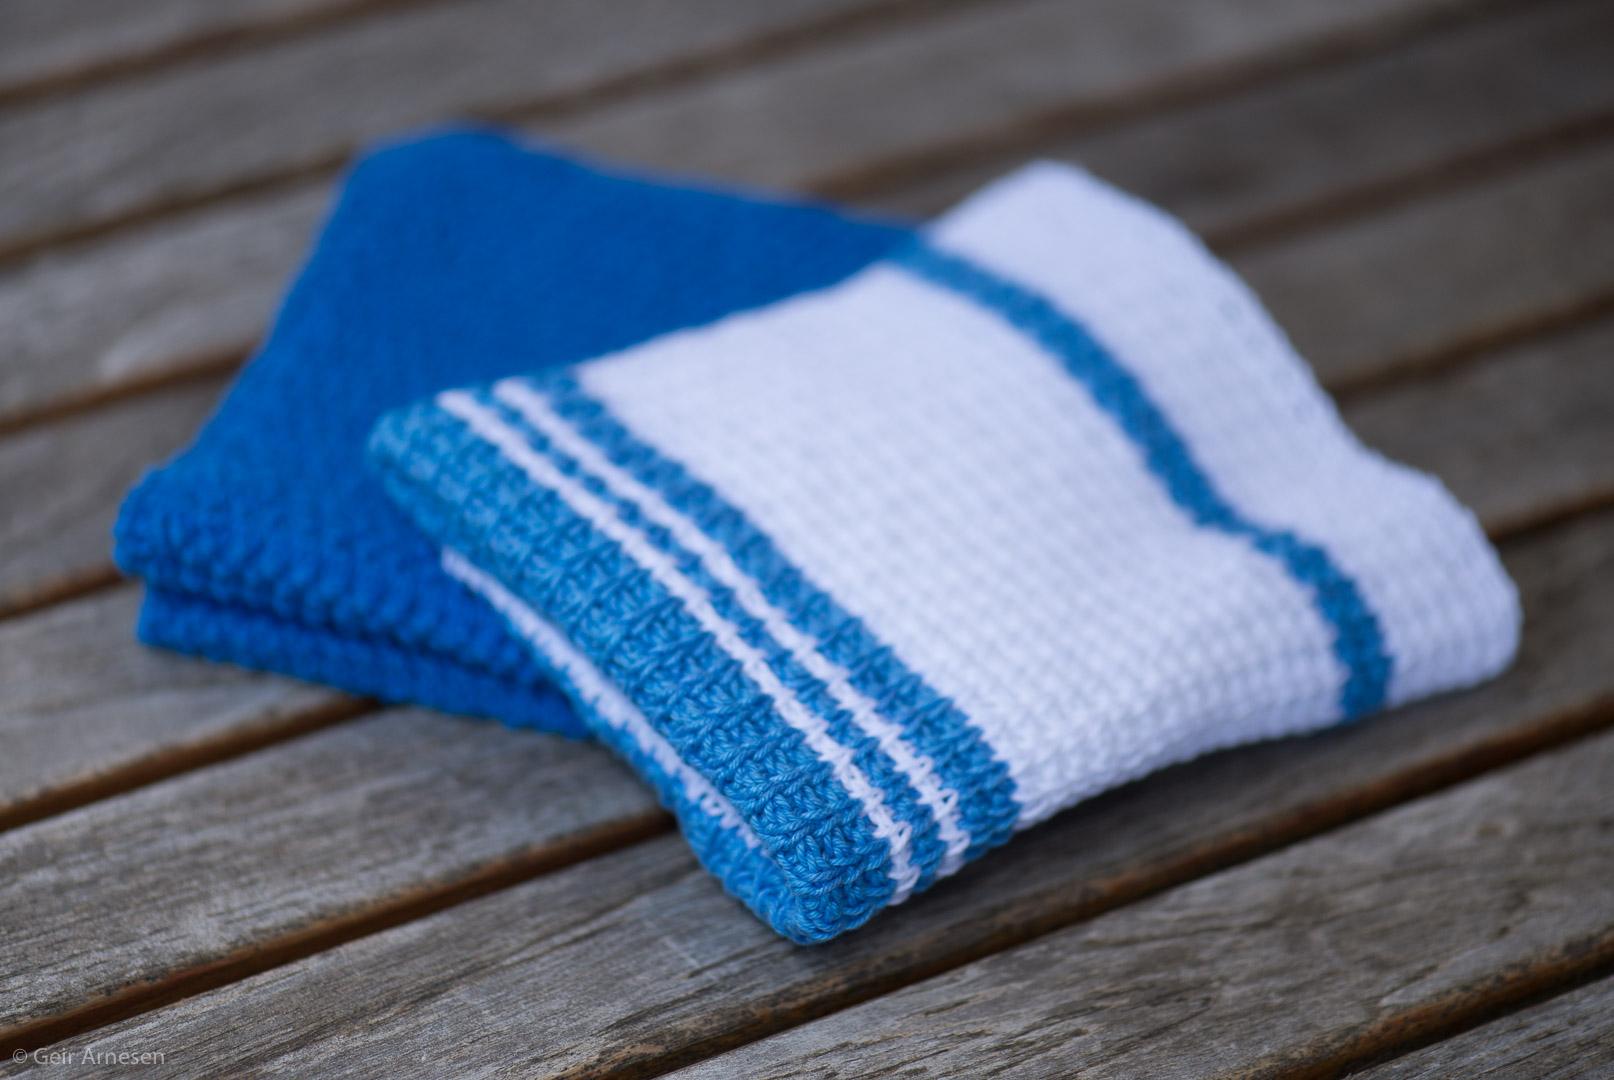 Er dere klare igjen? I morgen kommer to nye kluteoppskrift, en strikket og en hakket!